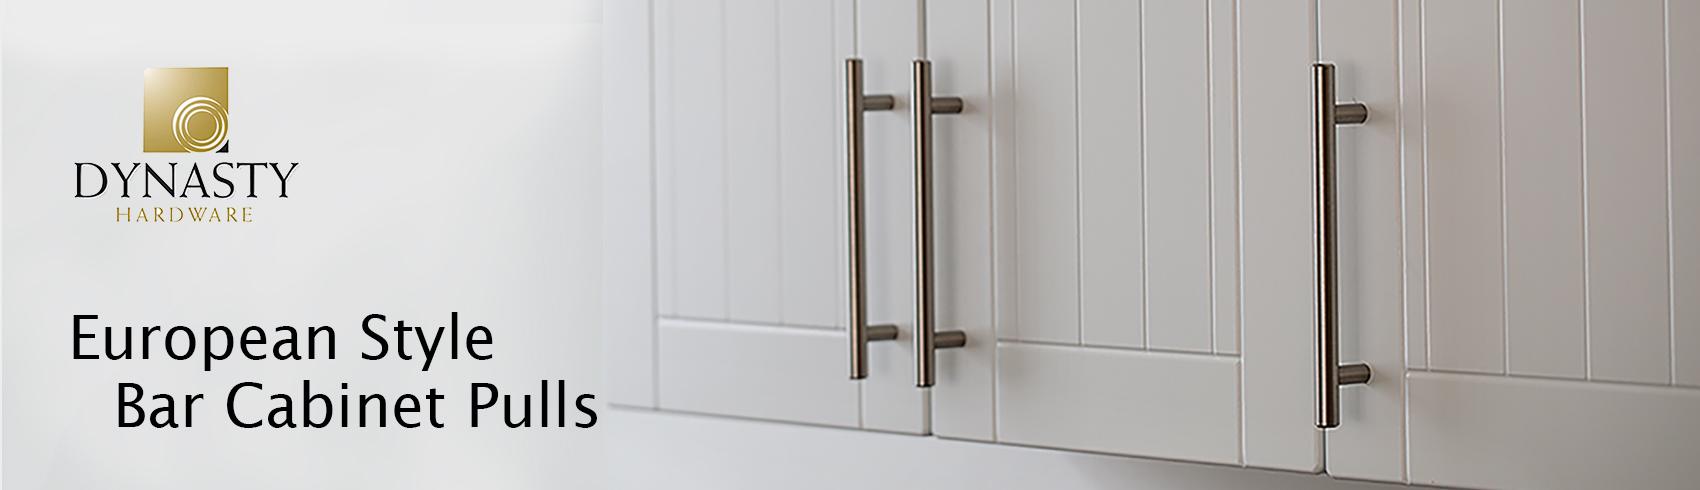 Polished Chrome Dynasty Hardware 8 Back to Back Tubular Shower Door Pull For Frameless Shower Doors With Trim Washers